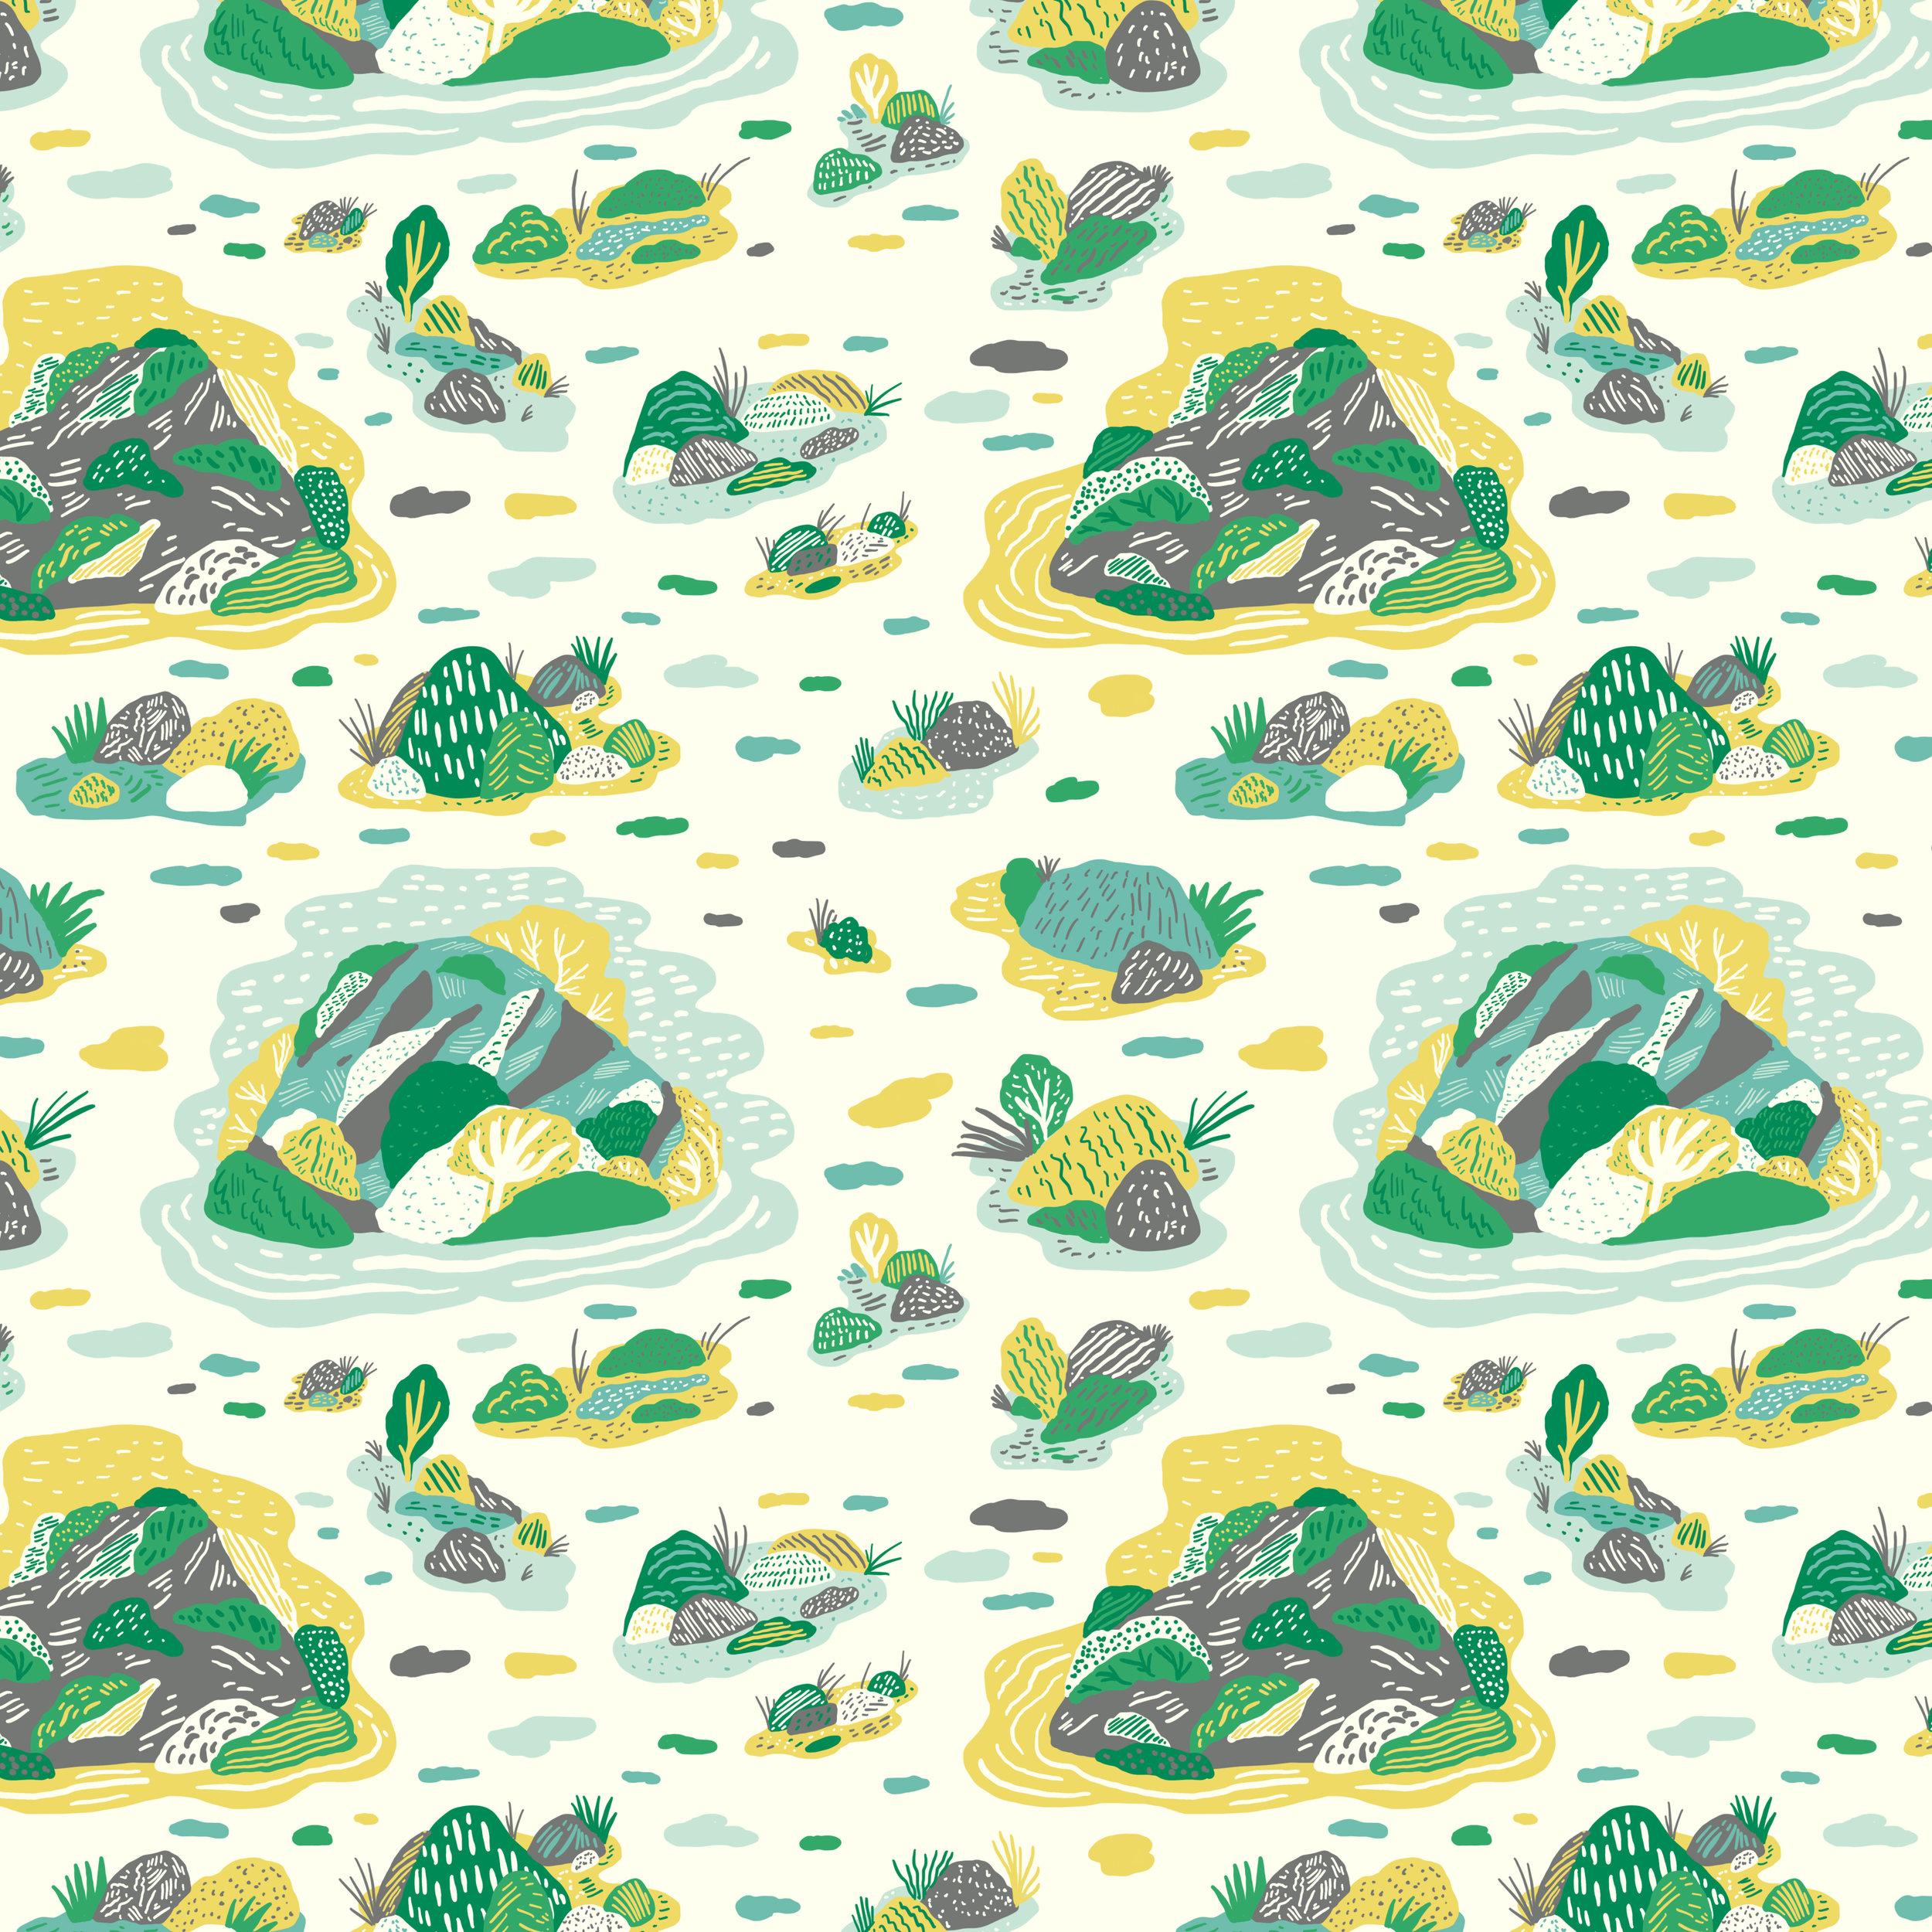 mountain pattern 2.JPG